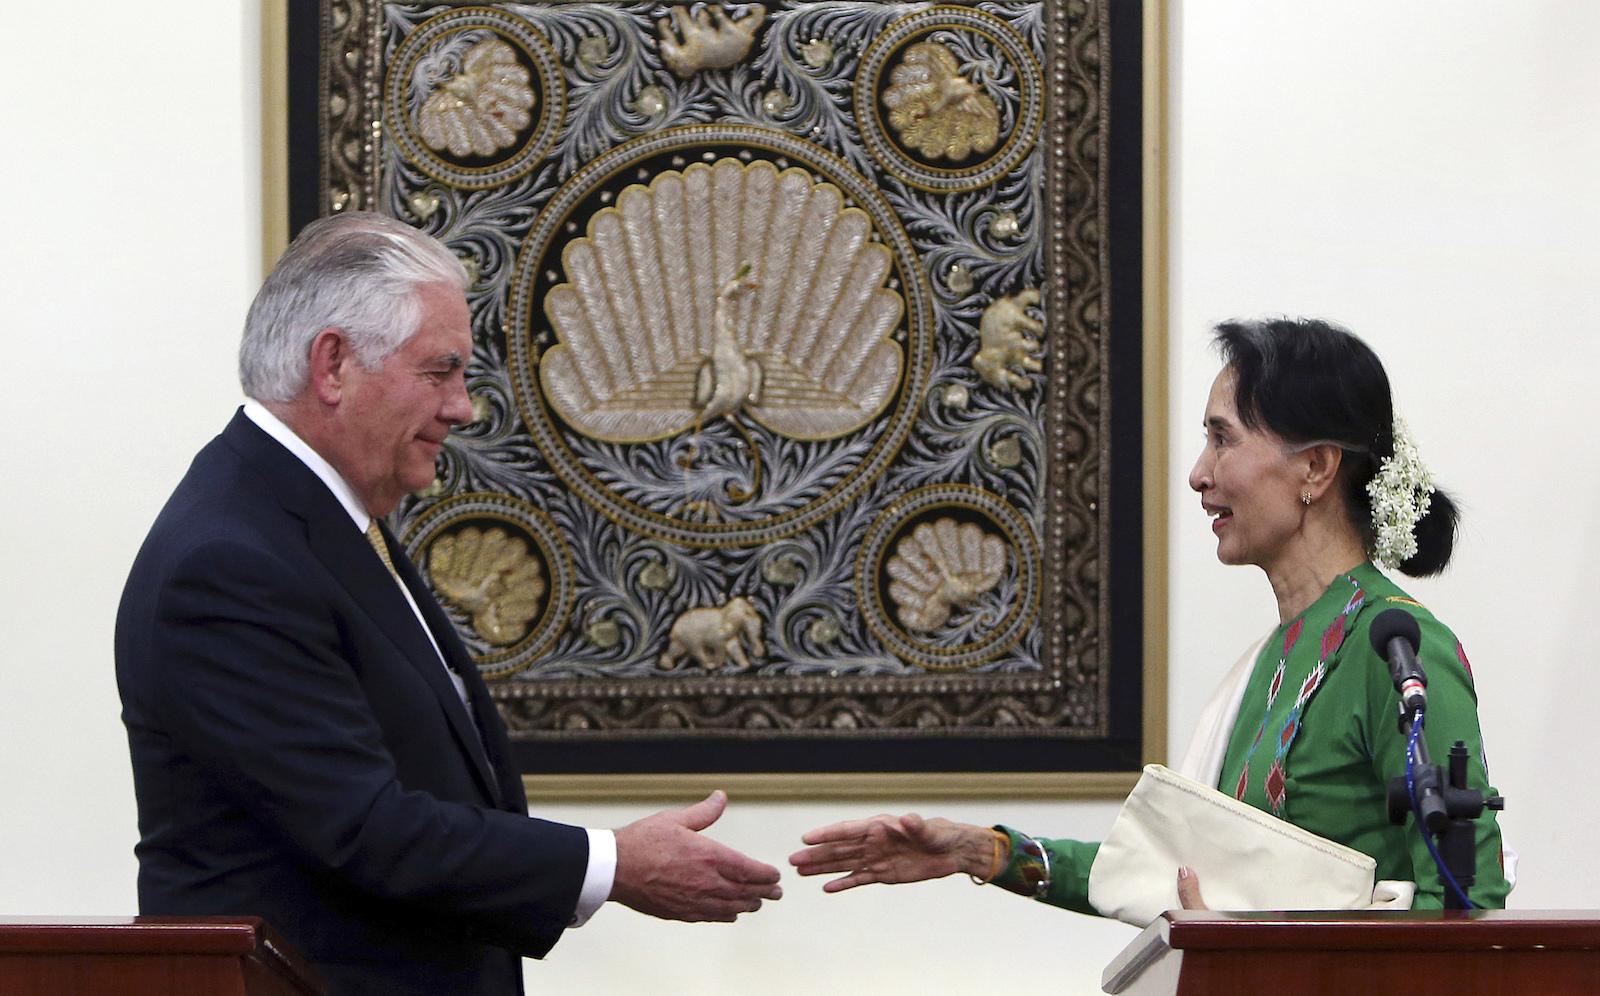 US Secretary of State Rex Tillerson meets Myanmar's de facto leader Aung San Suu Kyi in Myanmar on November 15, 2017